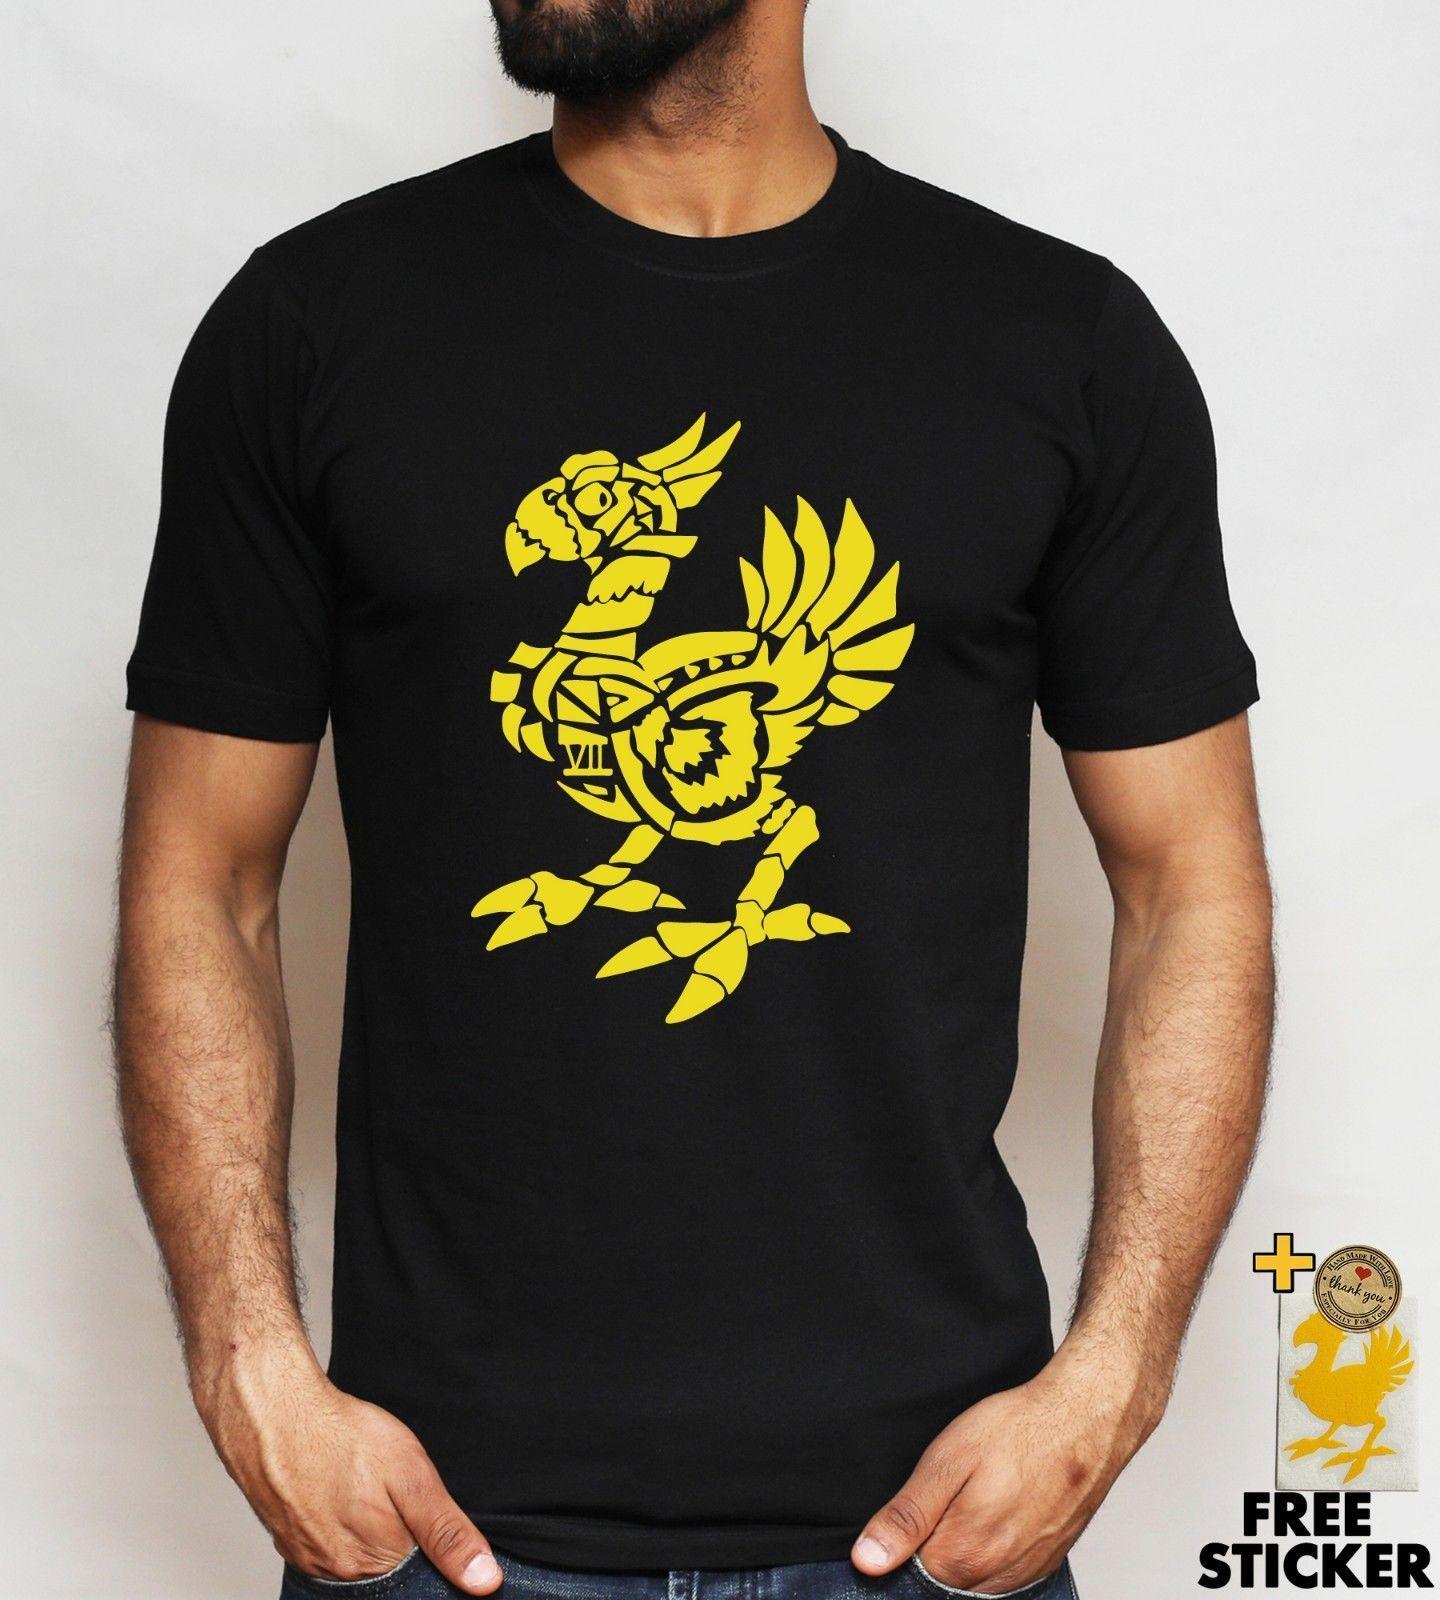 Chocobo FF7 FF15 T Shirt Cloud Final Fantasy Fans Cool Gamers Tee For Men  Women